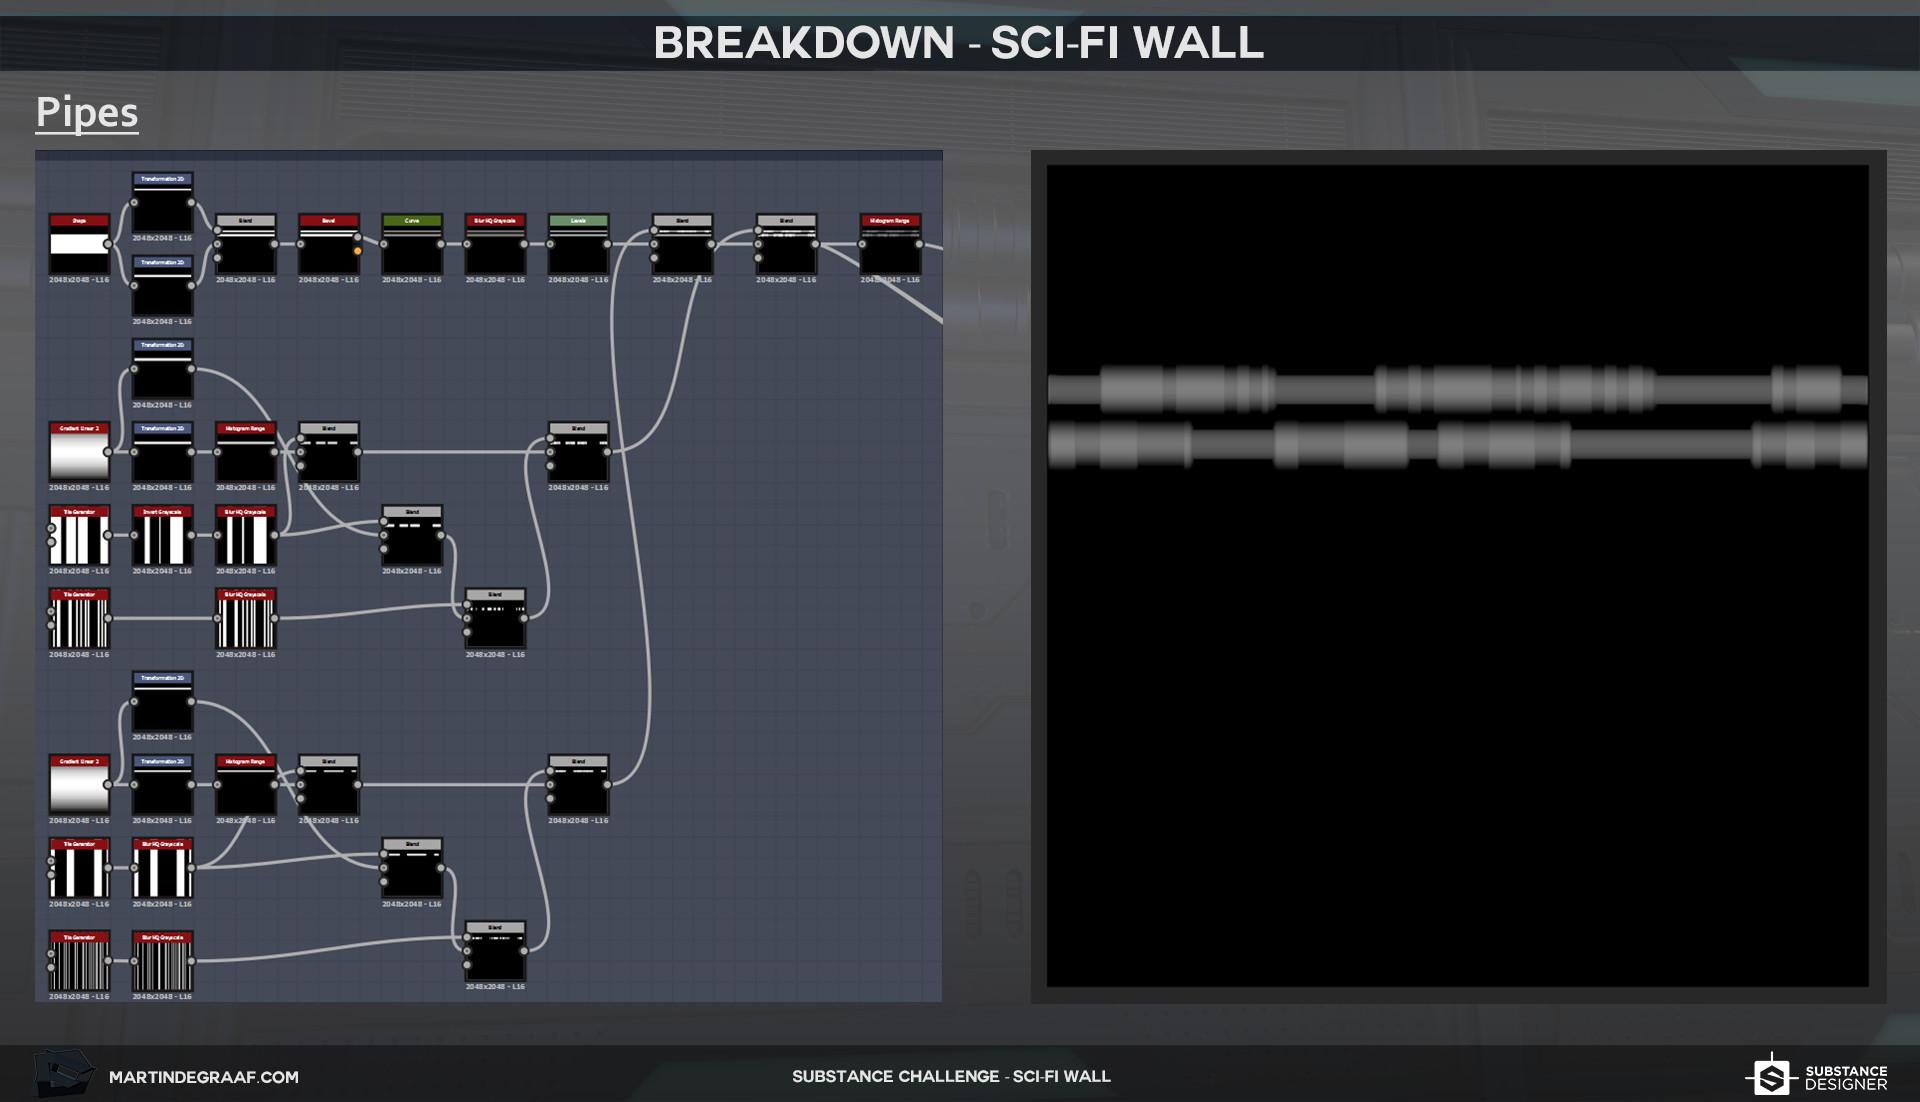 Martin de graaf substance challenge sci fi wall substance breakdown1 martin de graaf 2017